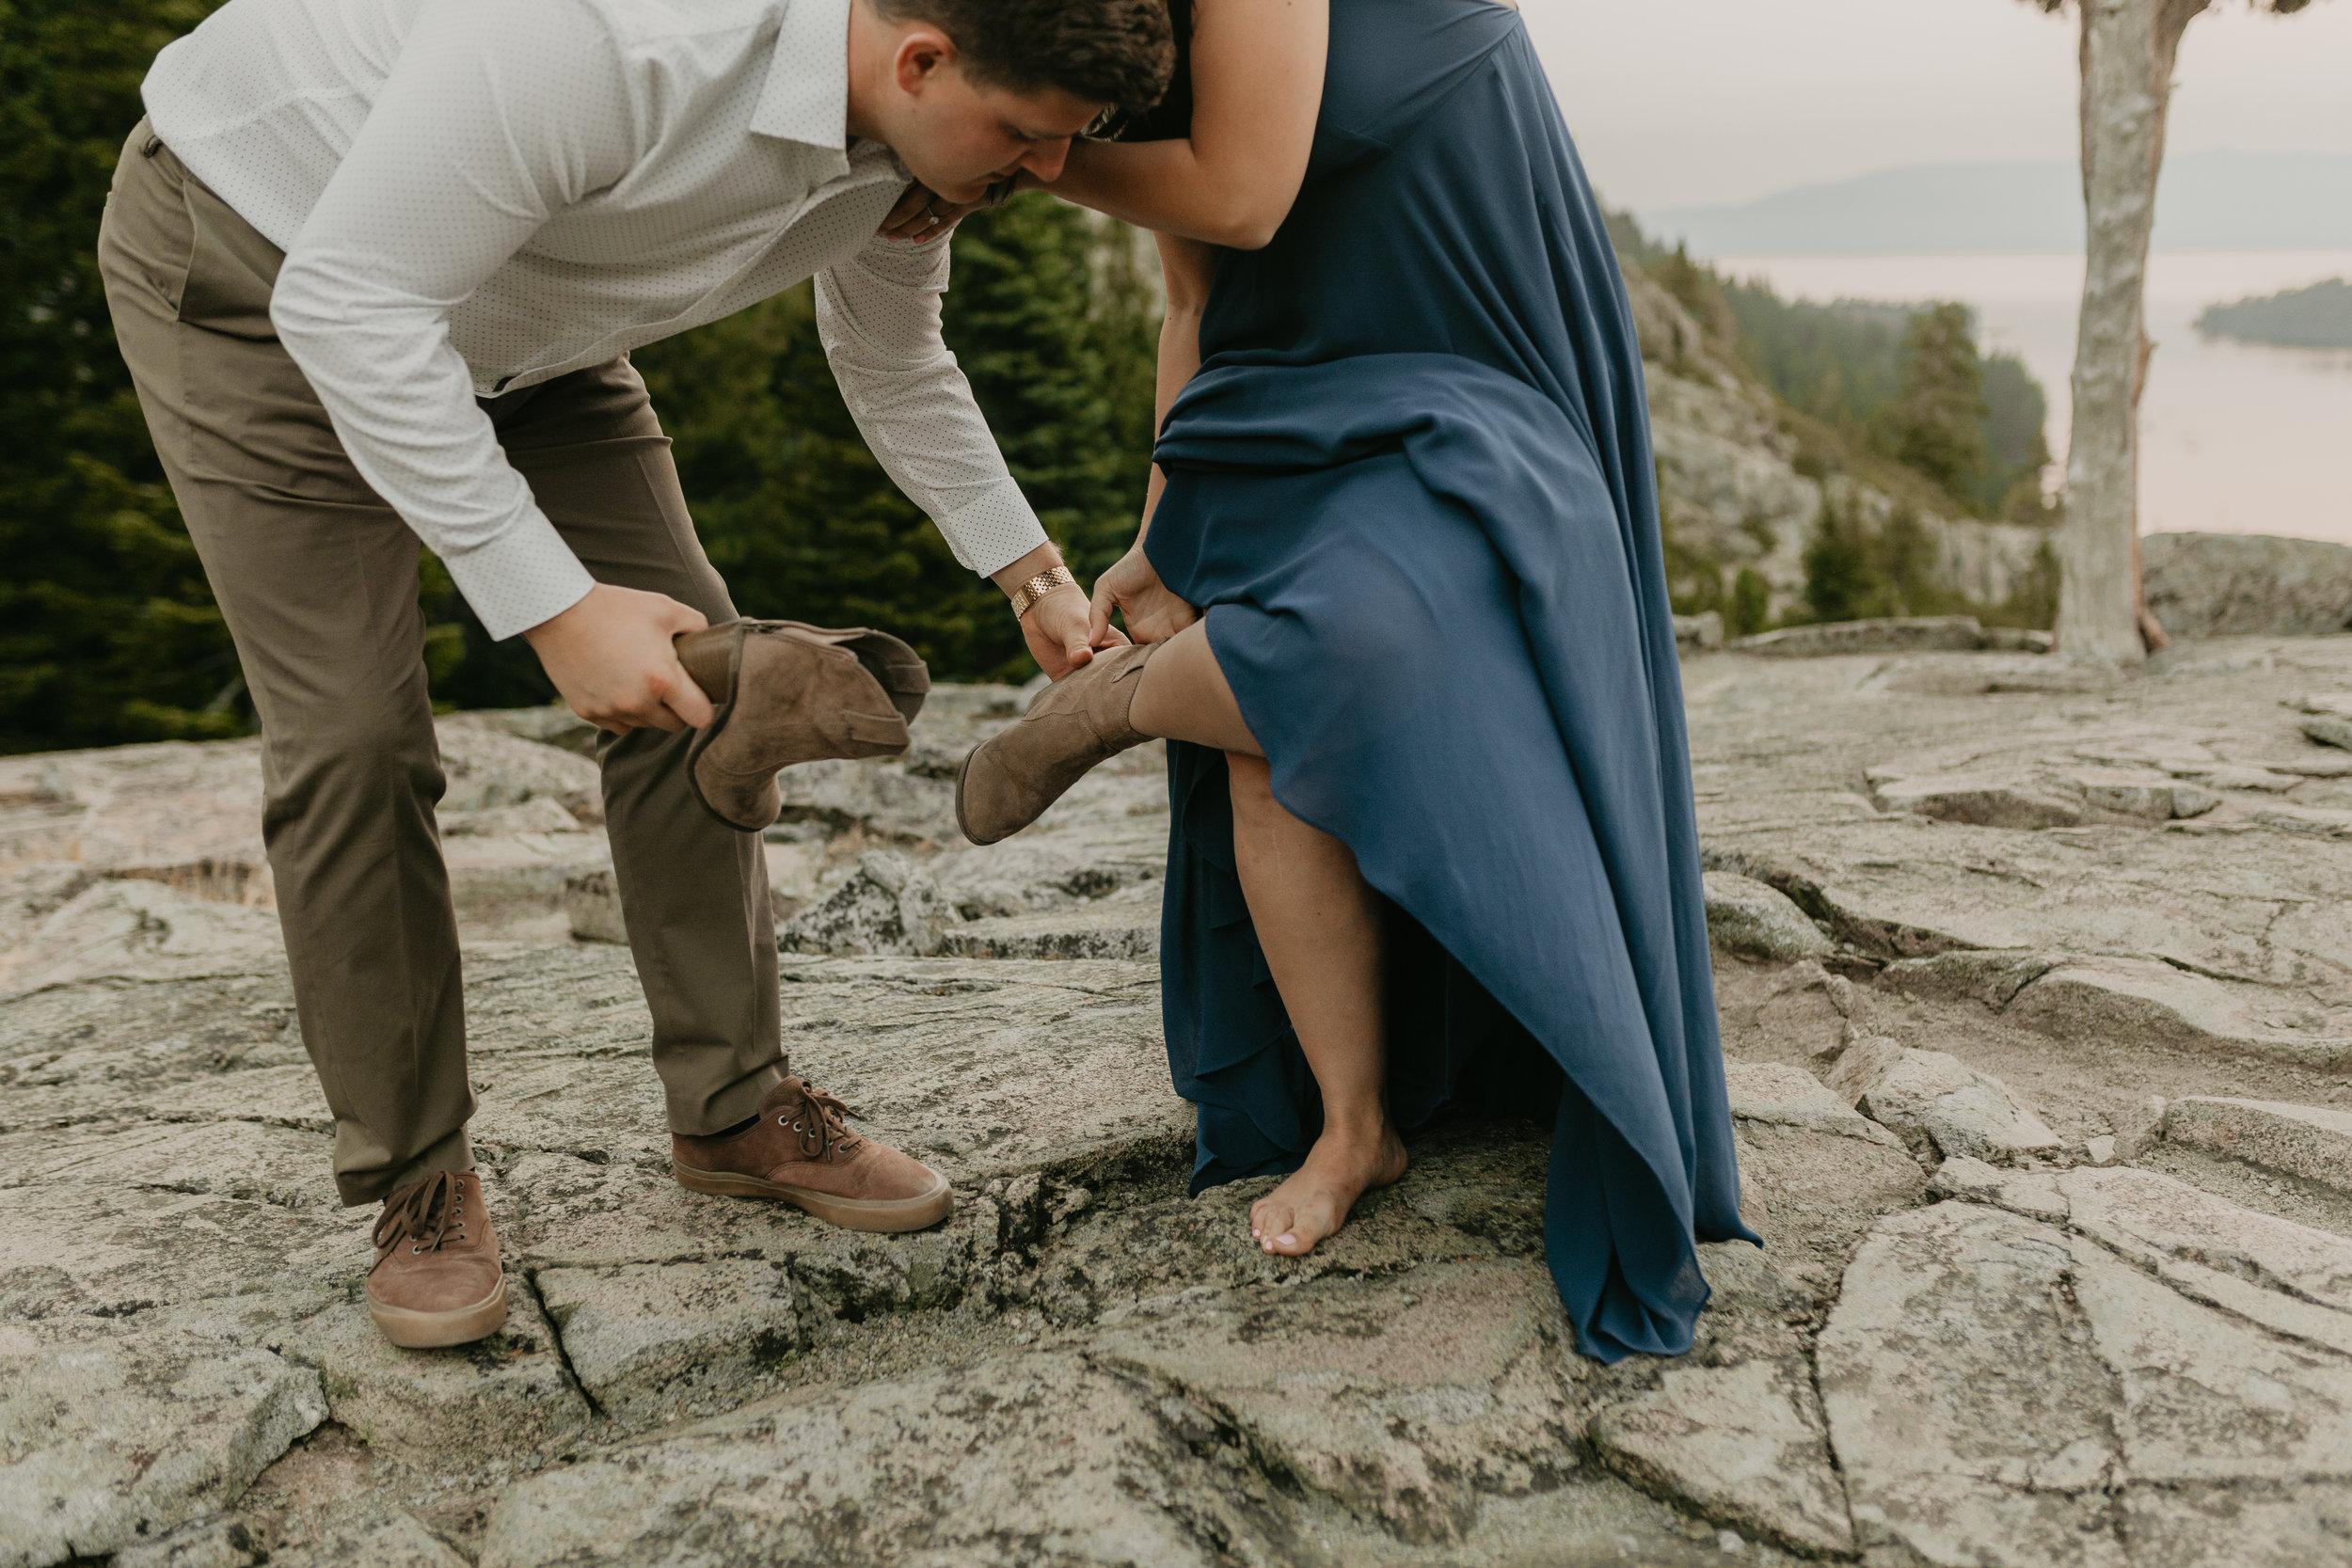 nicole-daacke-photography-lake-tahoe-sunrise-summer-adventure-engagement-photos-nevada-wedding-elopement-photographer-golden-emerald-bay-light-pine-trees-summer-vibe-fun-carefree-authentic-love-1.jpg